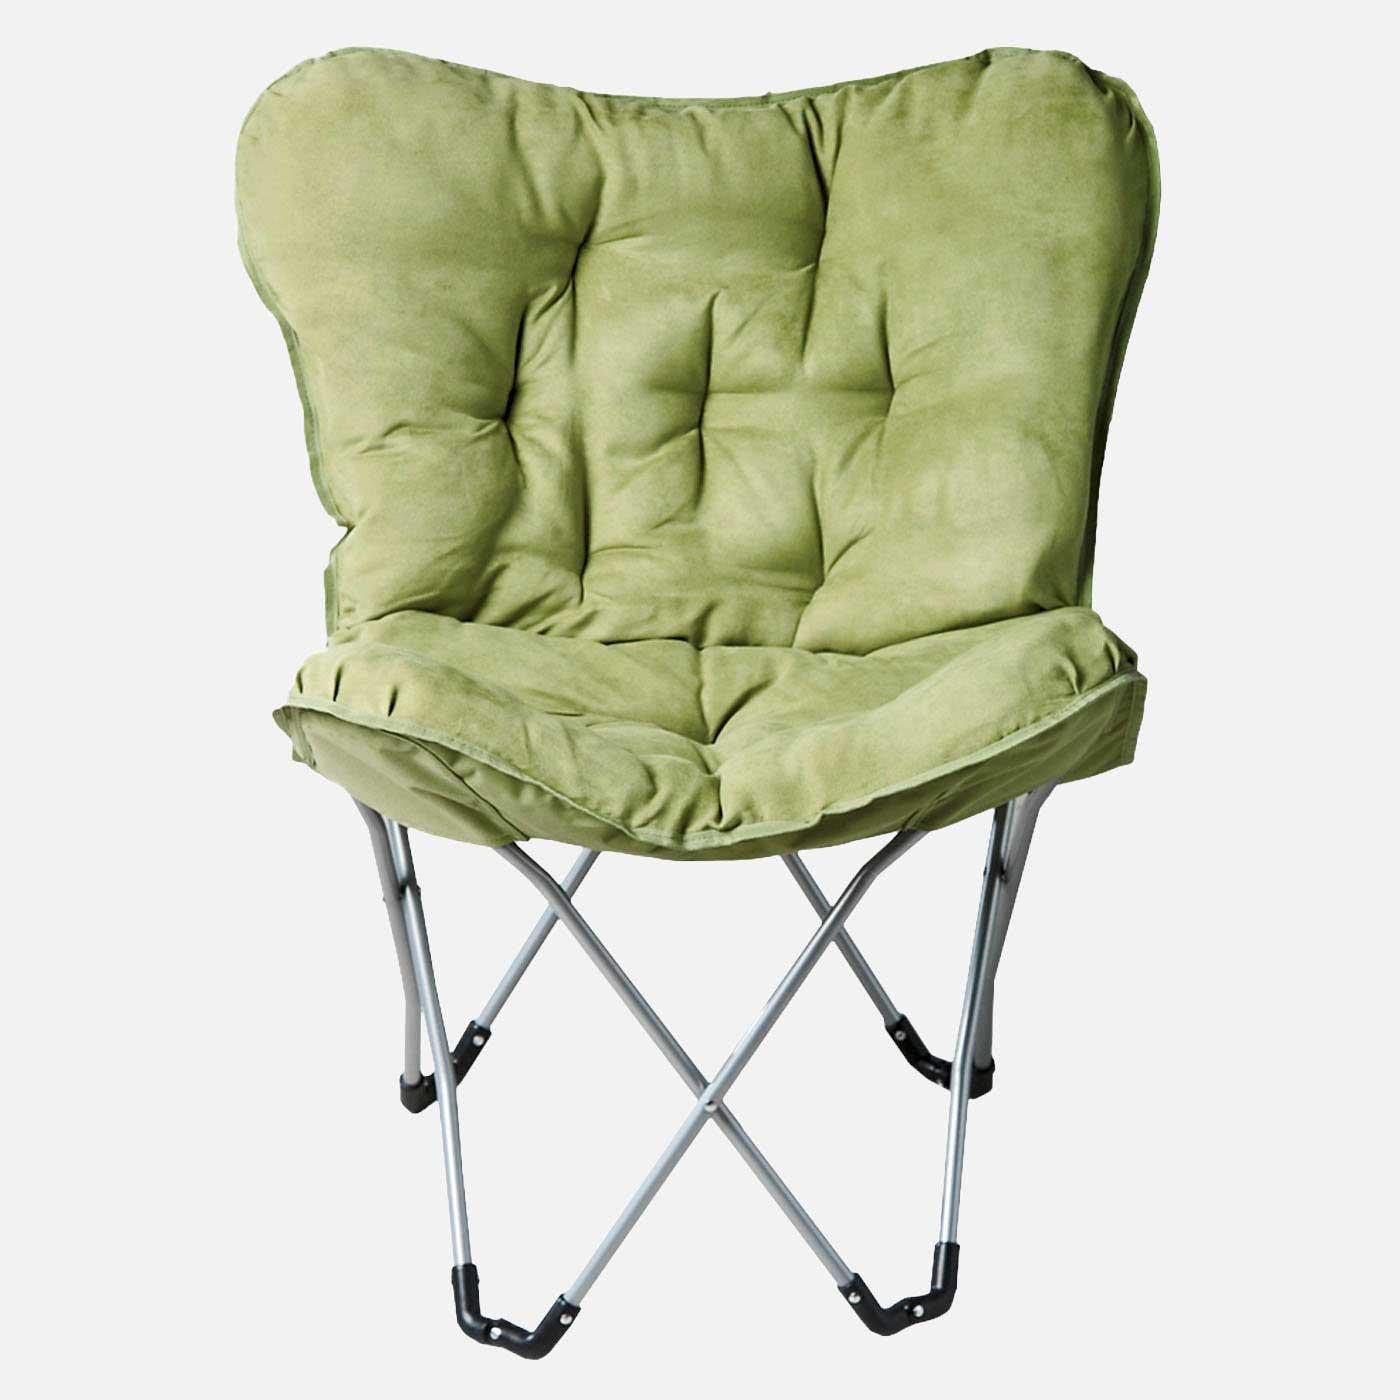 Stupendous Foldong Chairs Facingwalls Inzonedesignstudio Interior Chair Design Inzonedesignstudiocom